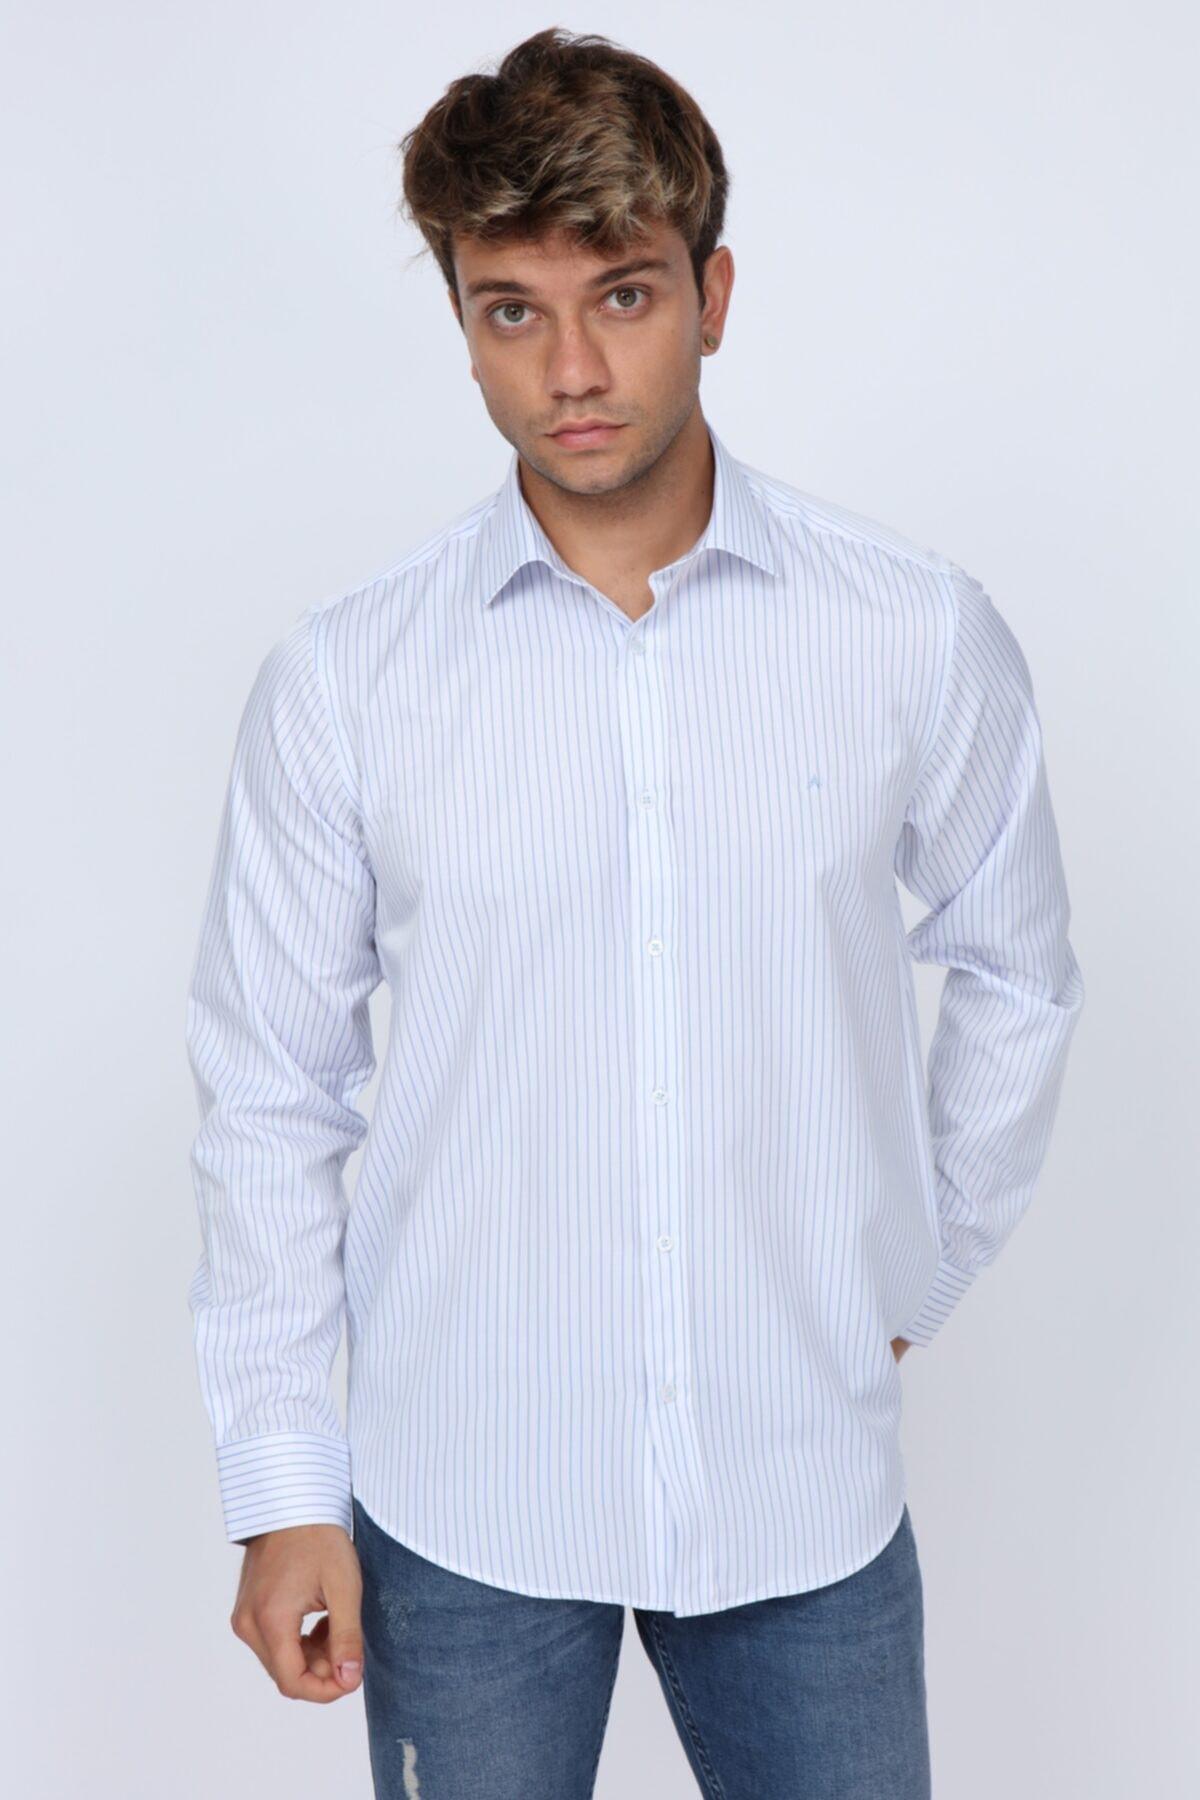 Abbate Club Açık Mavi Çizgili Slim Fit Erkek Gömlek 1